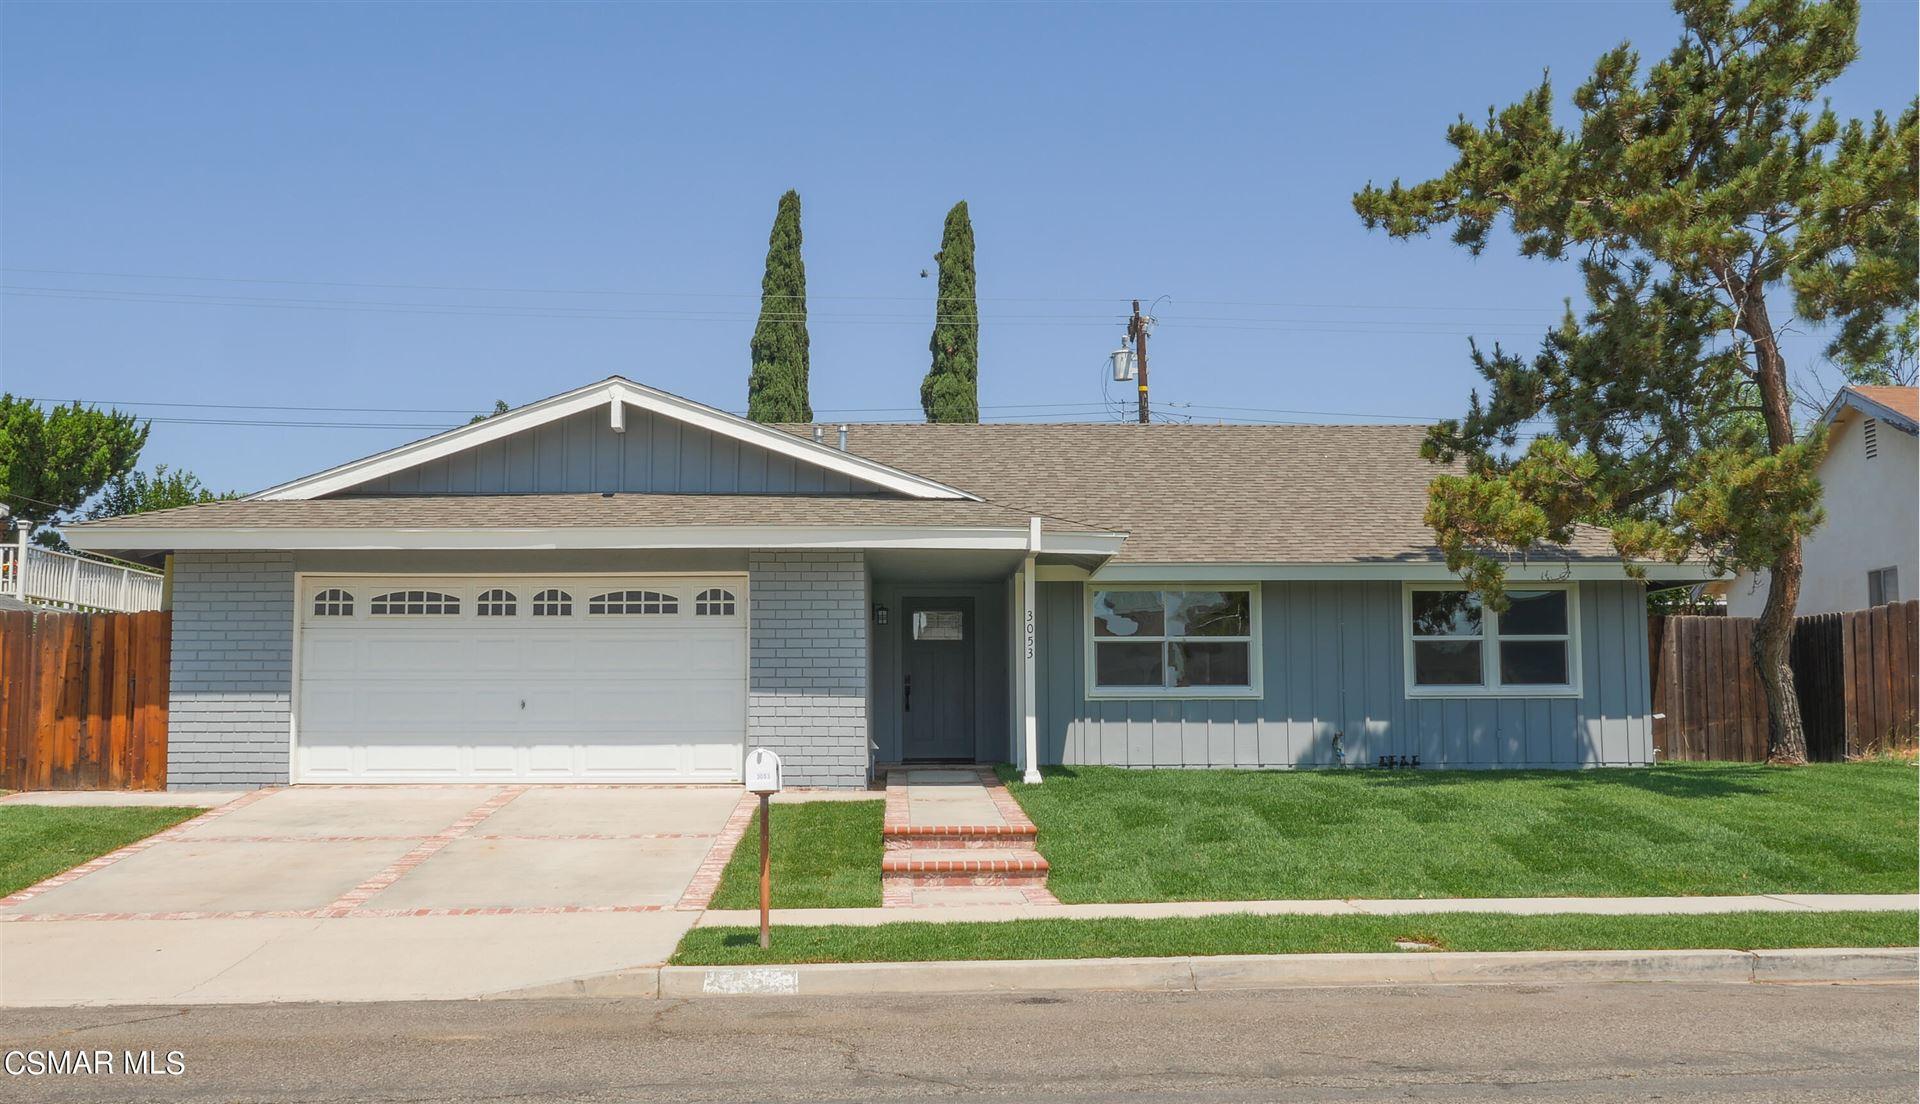 3053 Galena Avenue, Simi Valley, CA 93065 - MLS#: 221003988